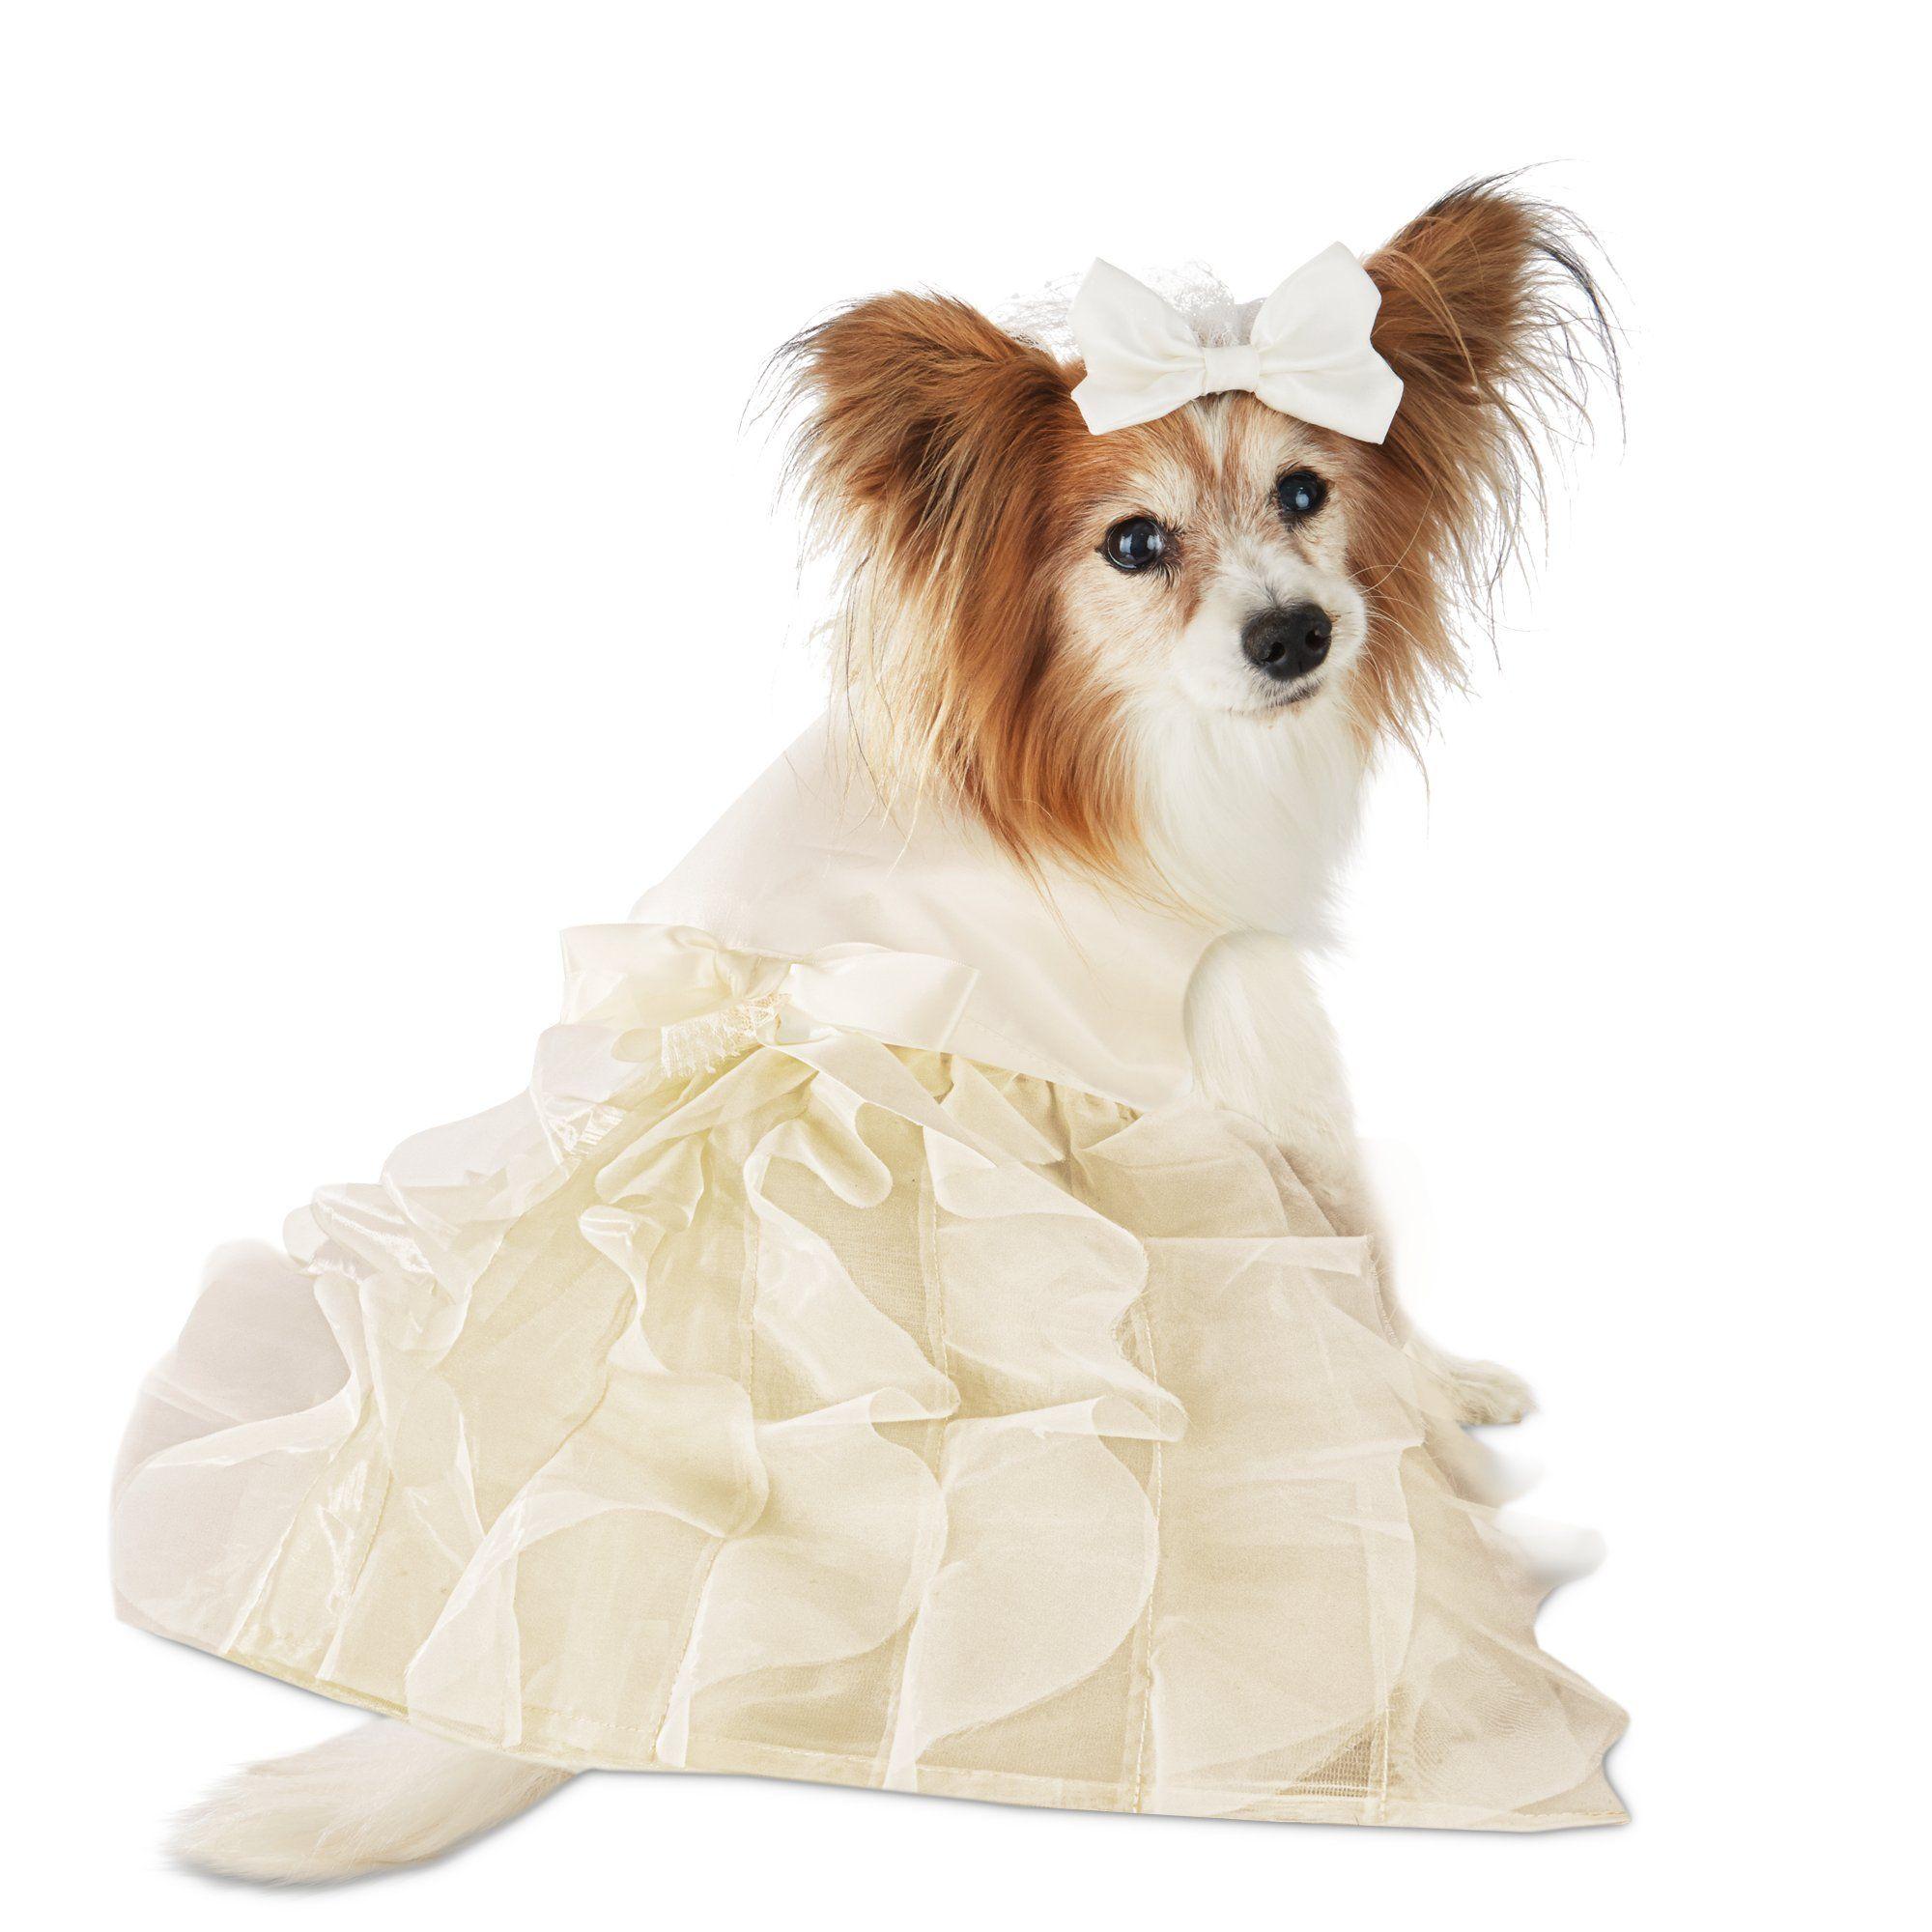 The You Me Wedding Dress Veil Set For Dogs Small Wedding Dress With Veil Dog Wedding Dog Wedding Dress